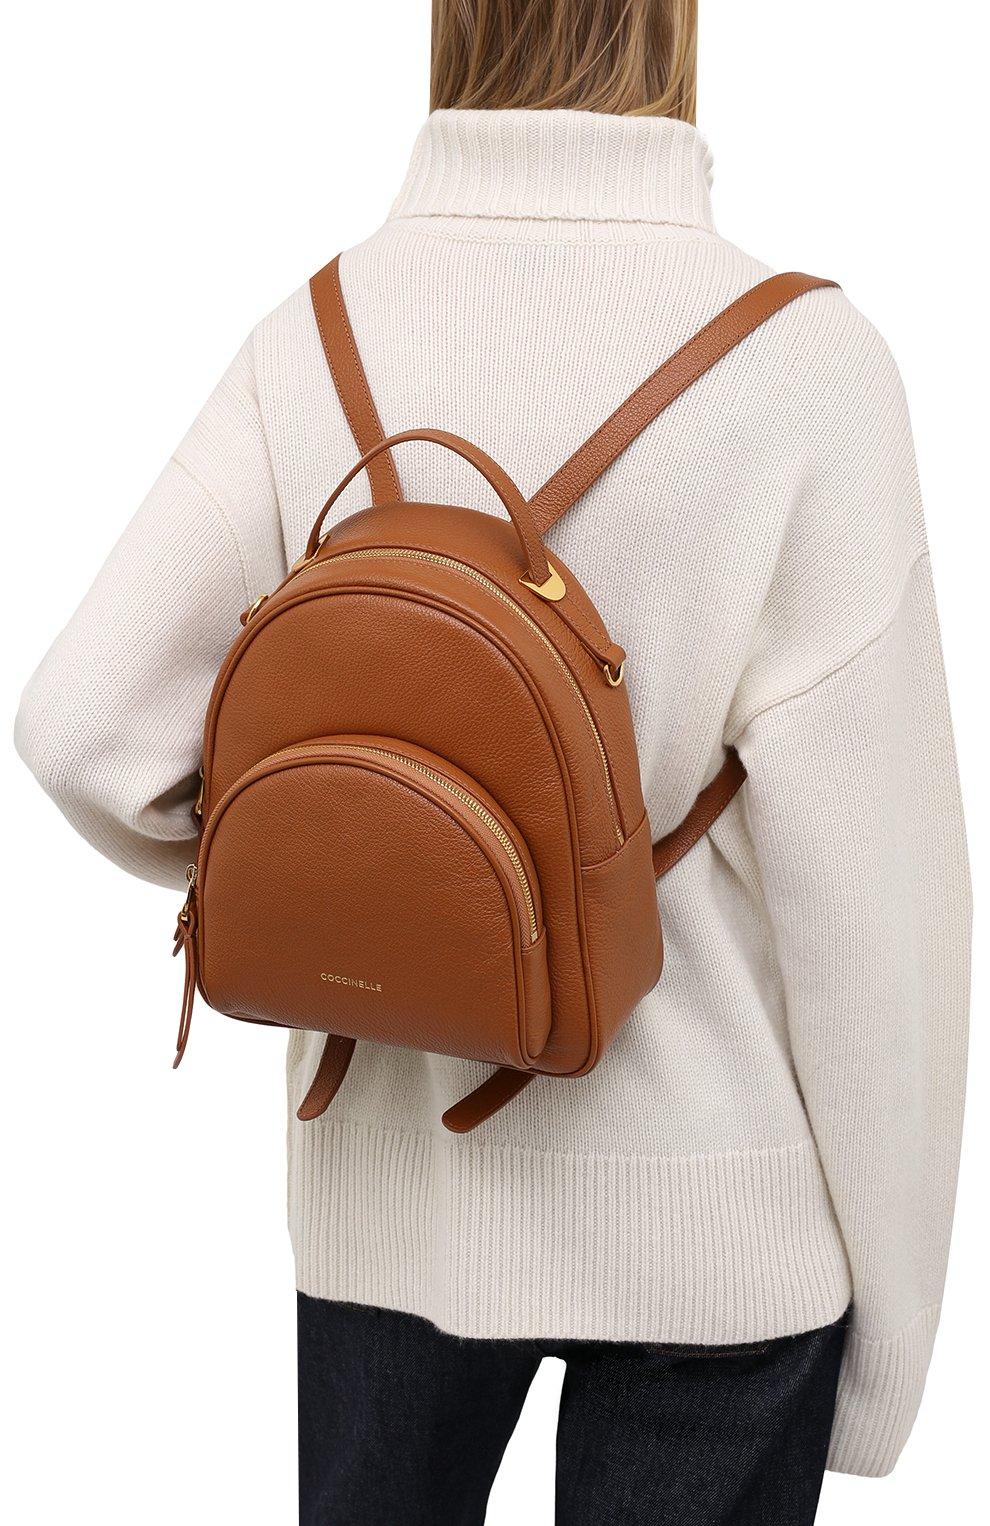 Женский рюкзак lea COCCINELLE коричневого цвета, арт. E1 H60 14 01 01 | Фото 2